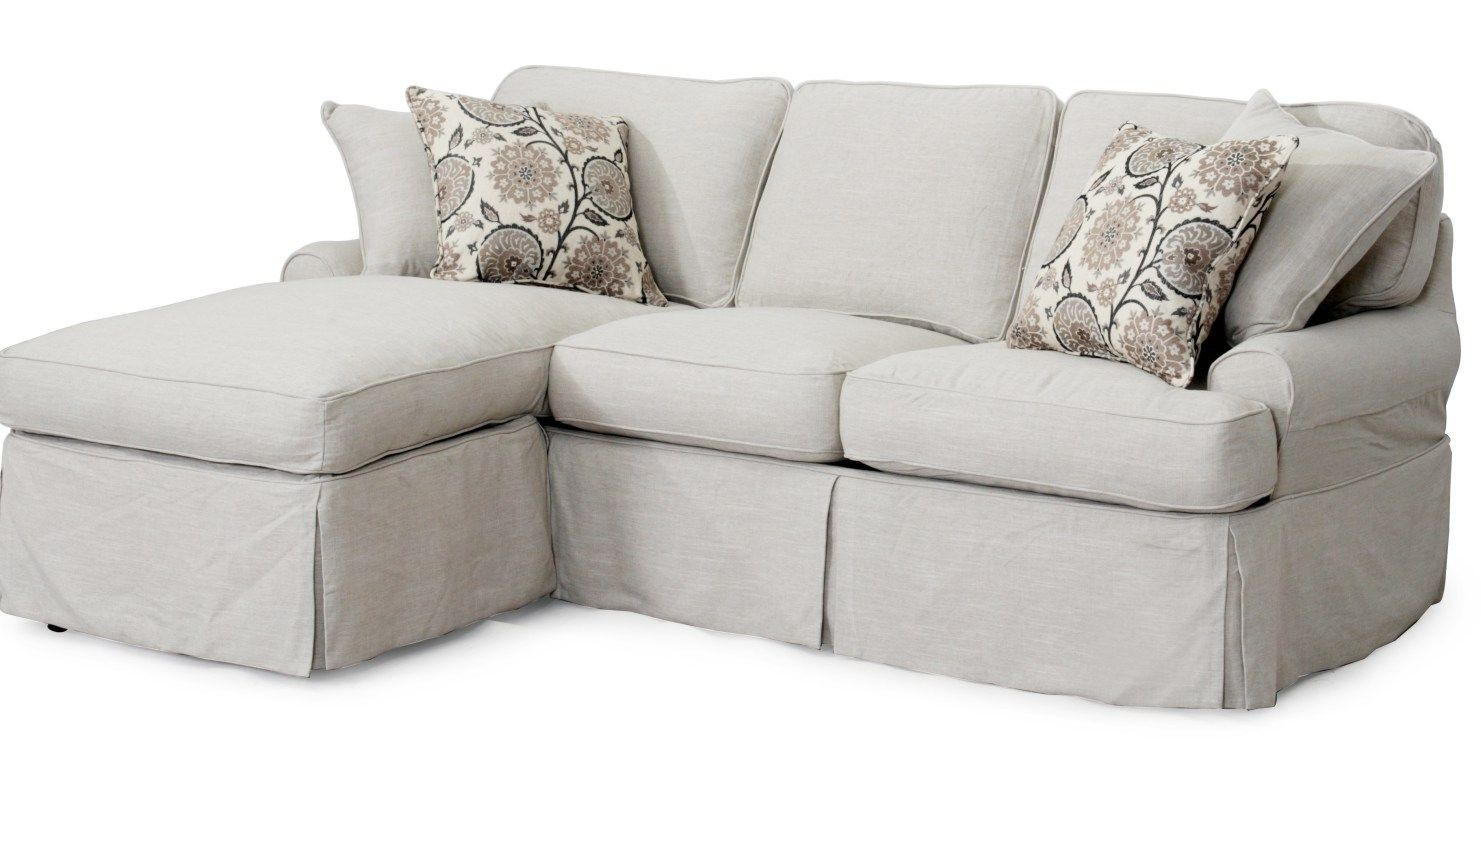 Modular Flip Flop Sleeper Sofa